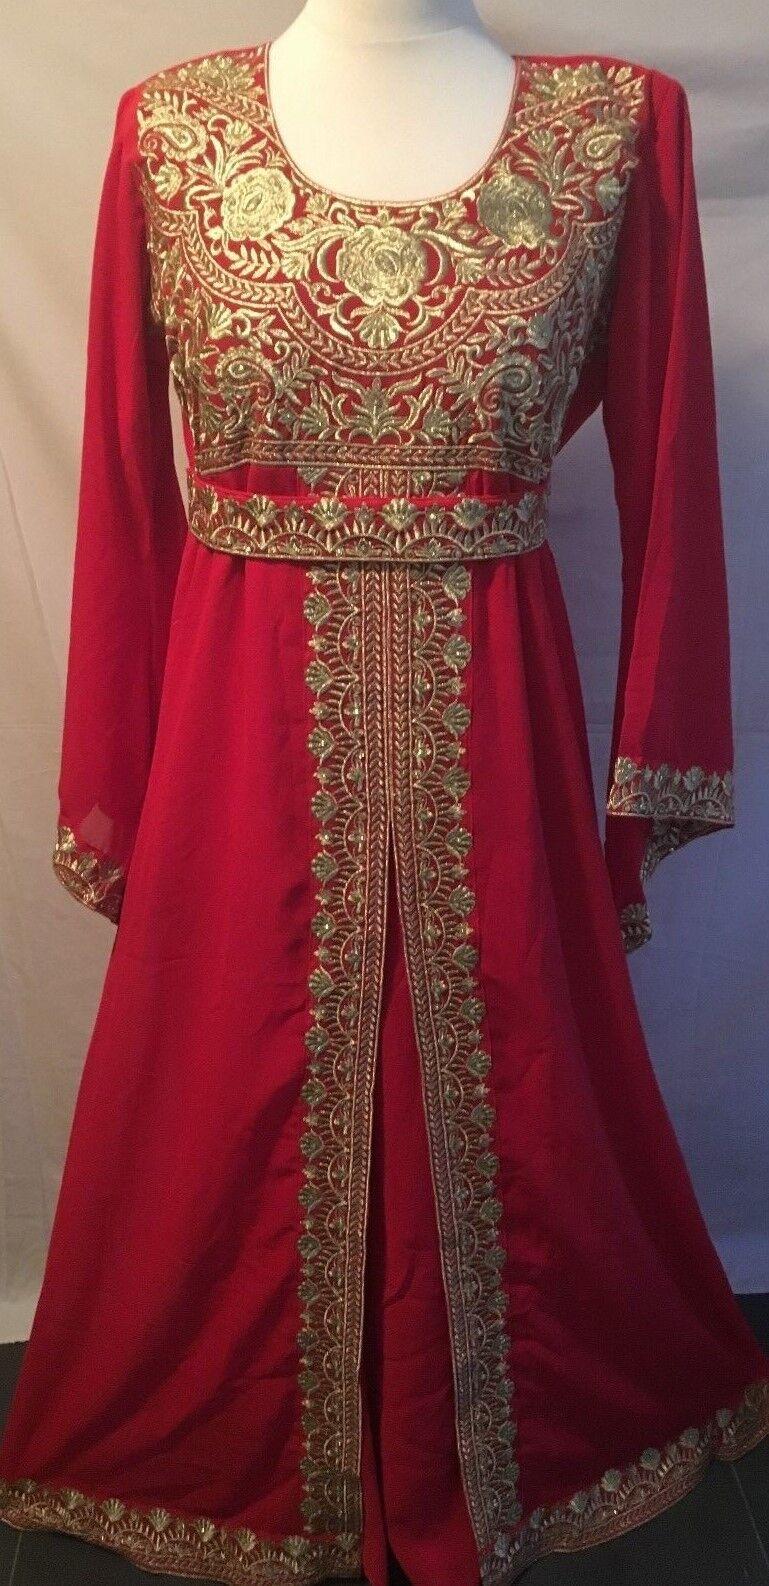 J25 Dubai Thread Kaftan Farasha Jalabiya Abaya Maxi Dress Navy & Purple